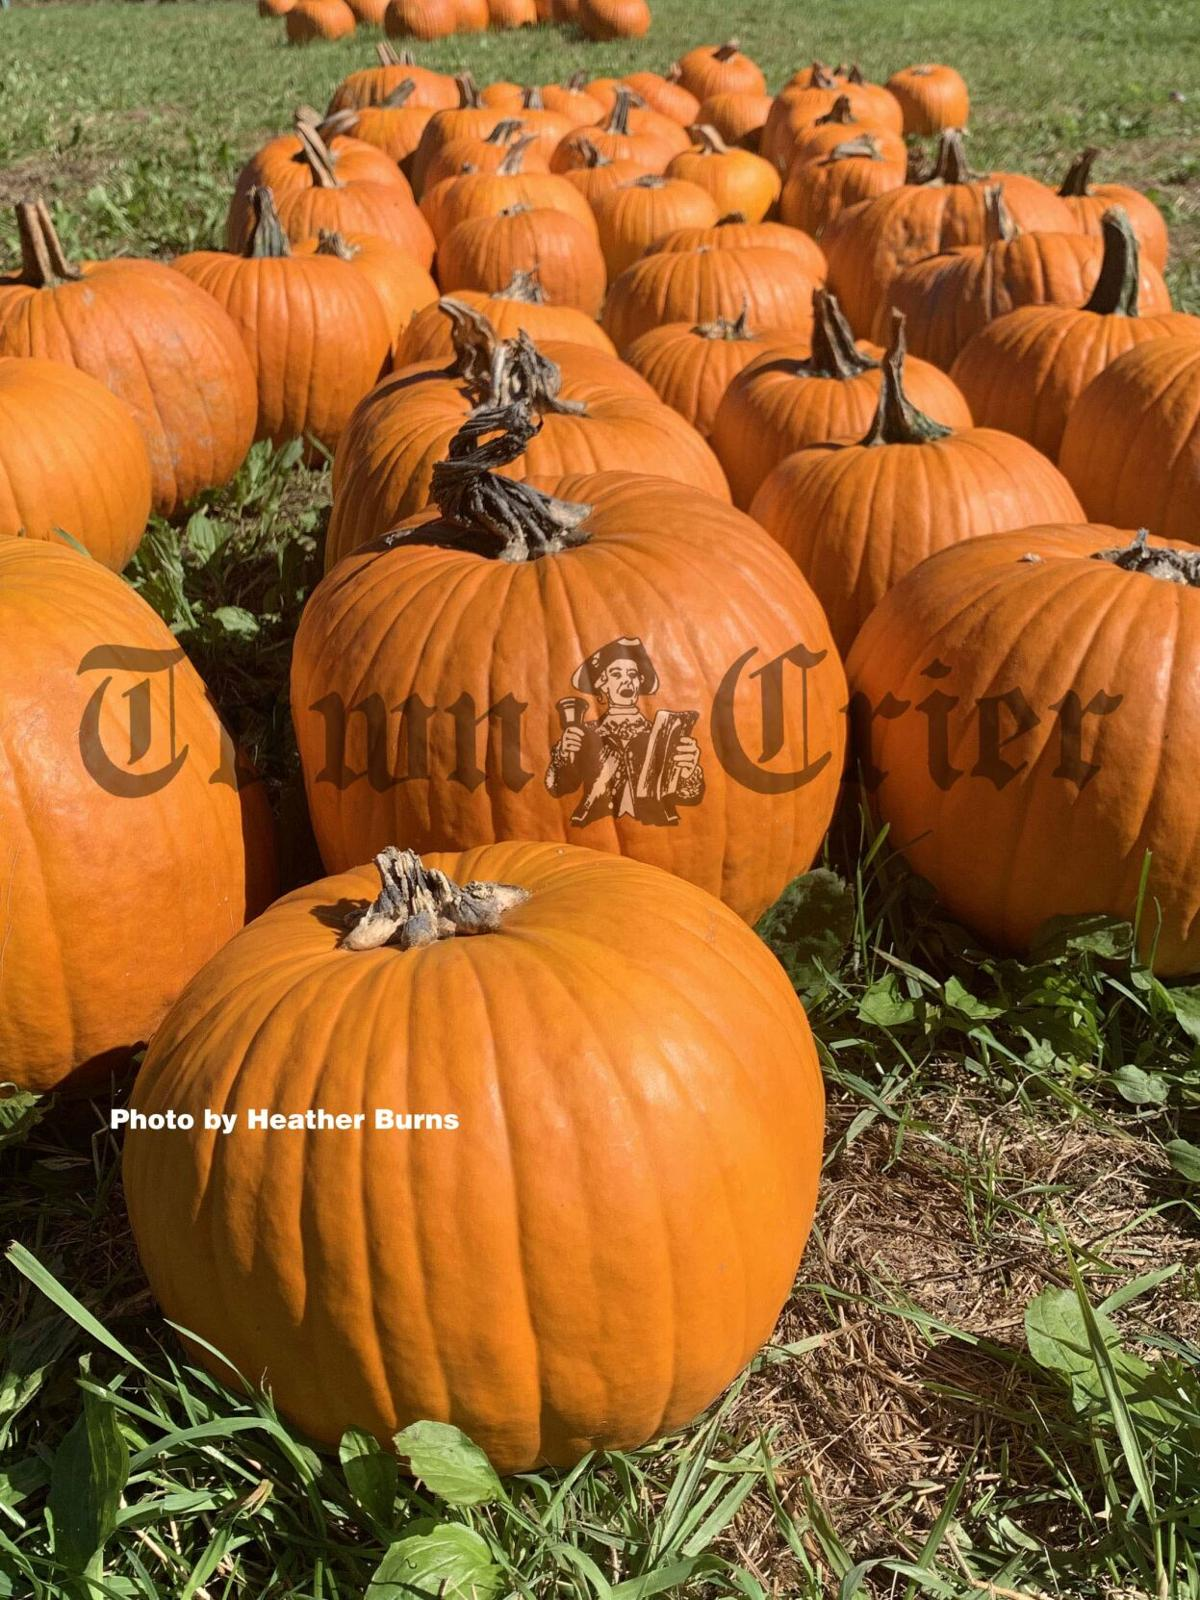 Krochmal Farms annual Pumpkin Festival